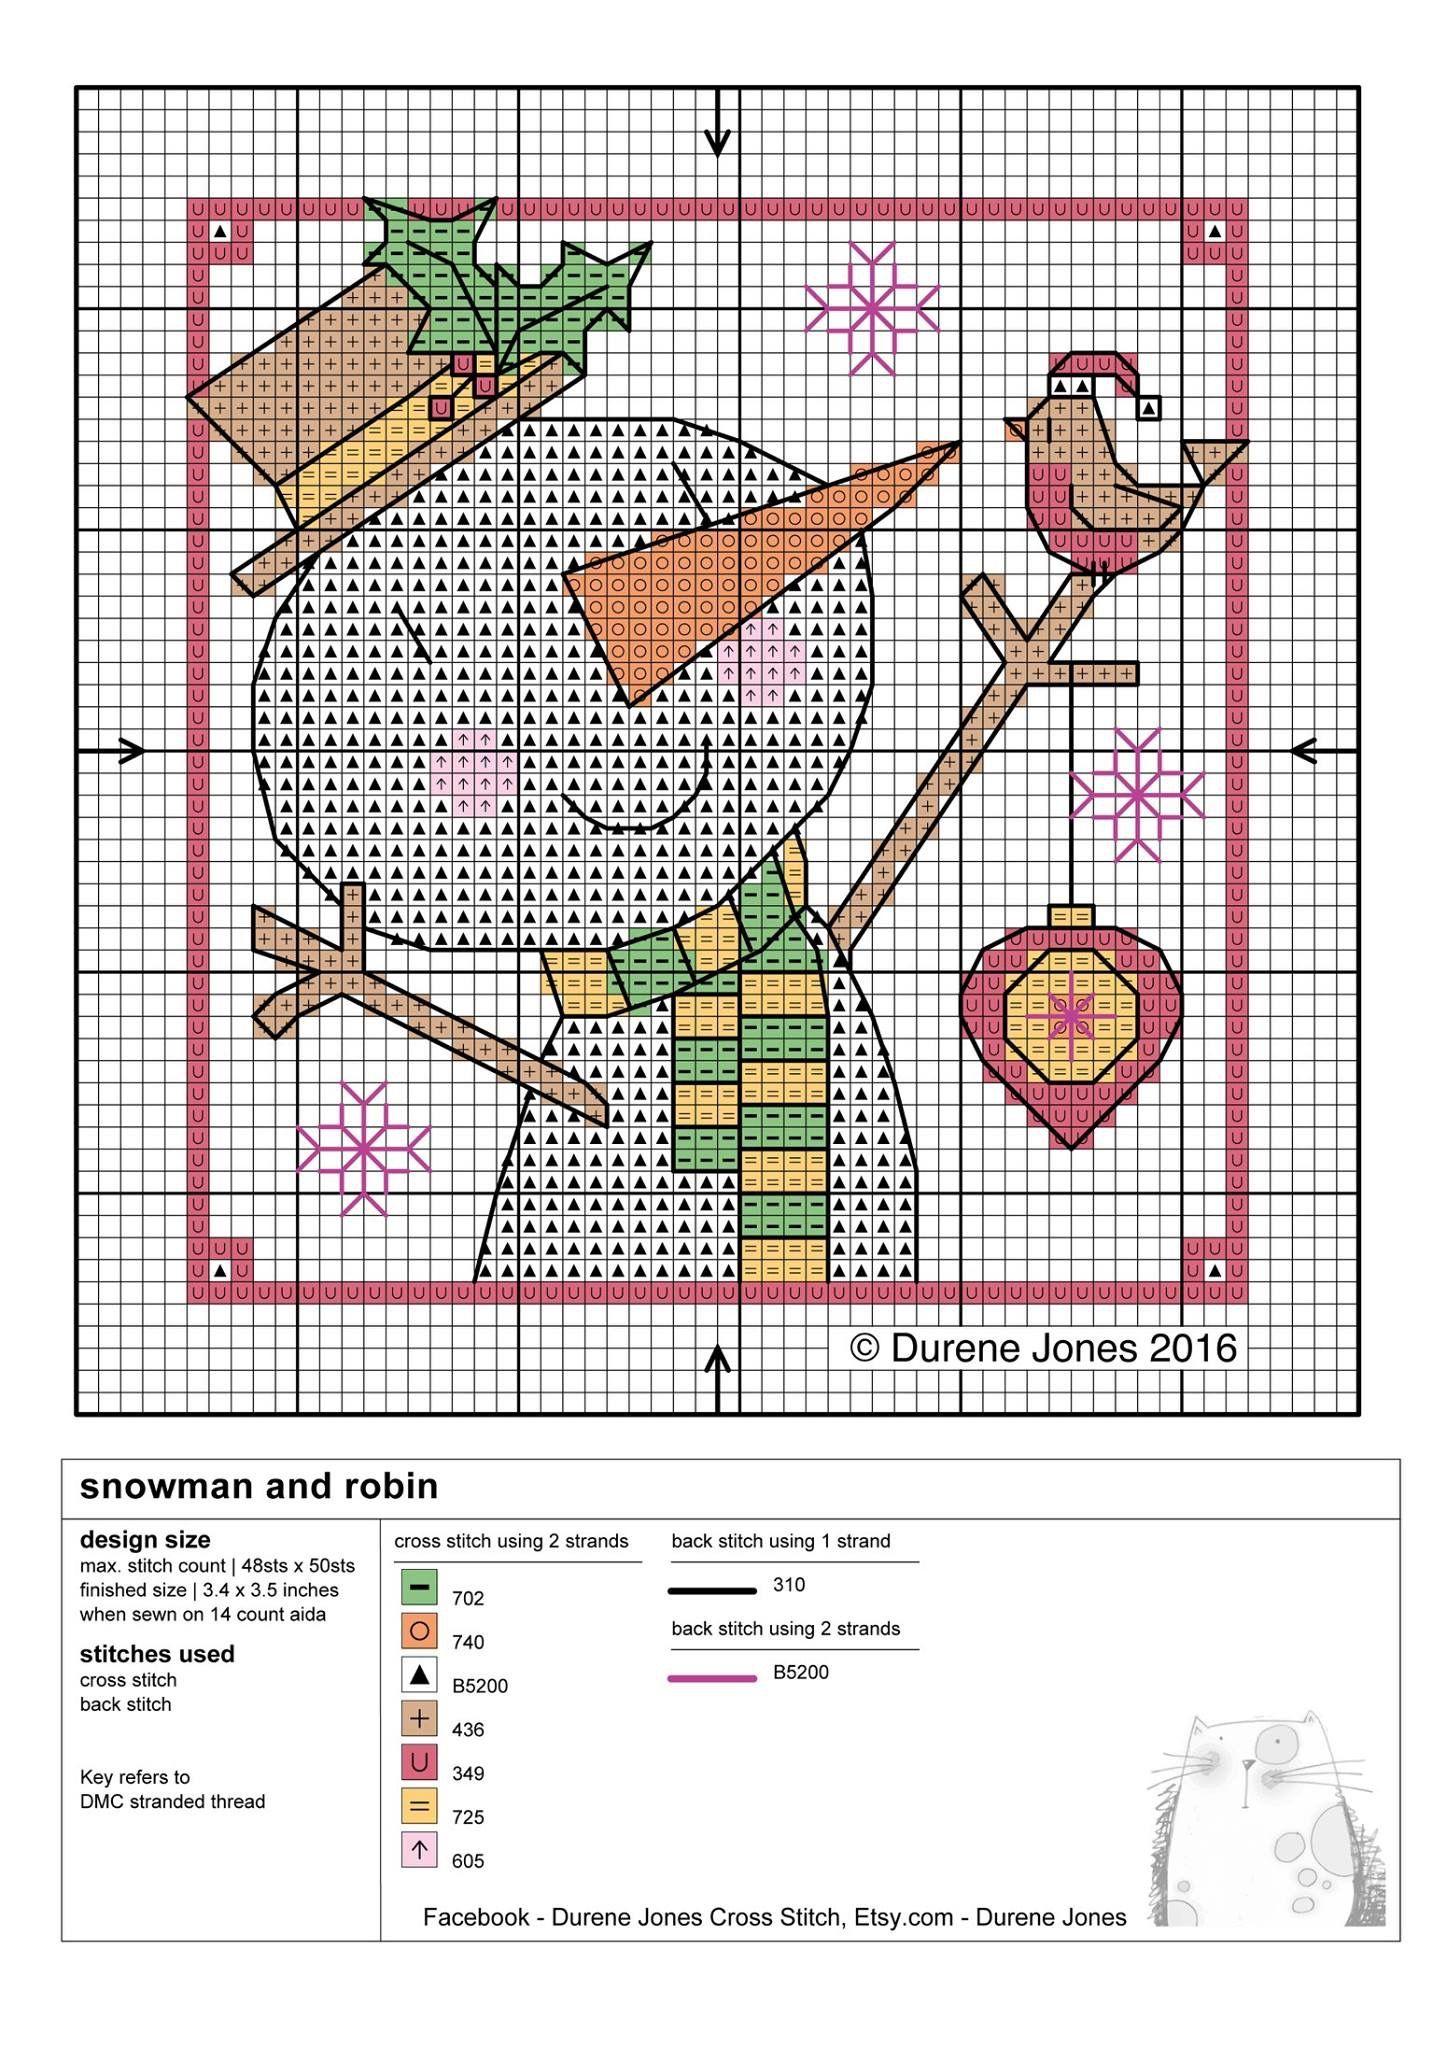 Pin de Nasia Toska en Cross stitching   Pinterest